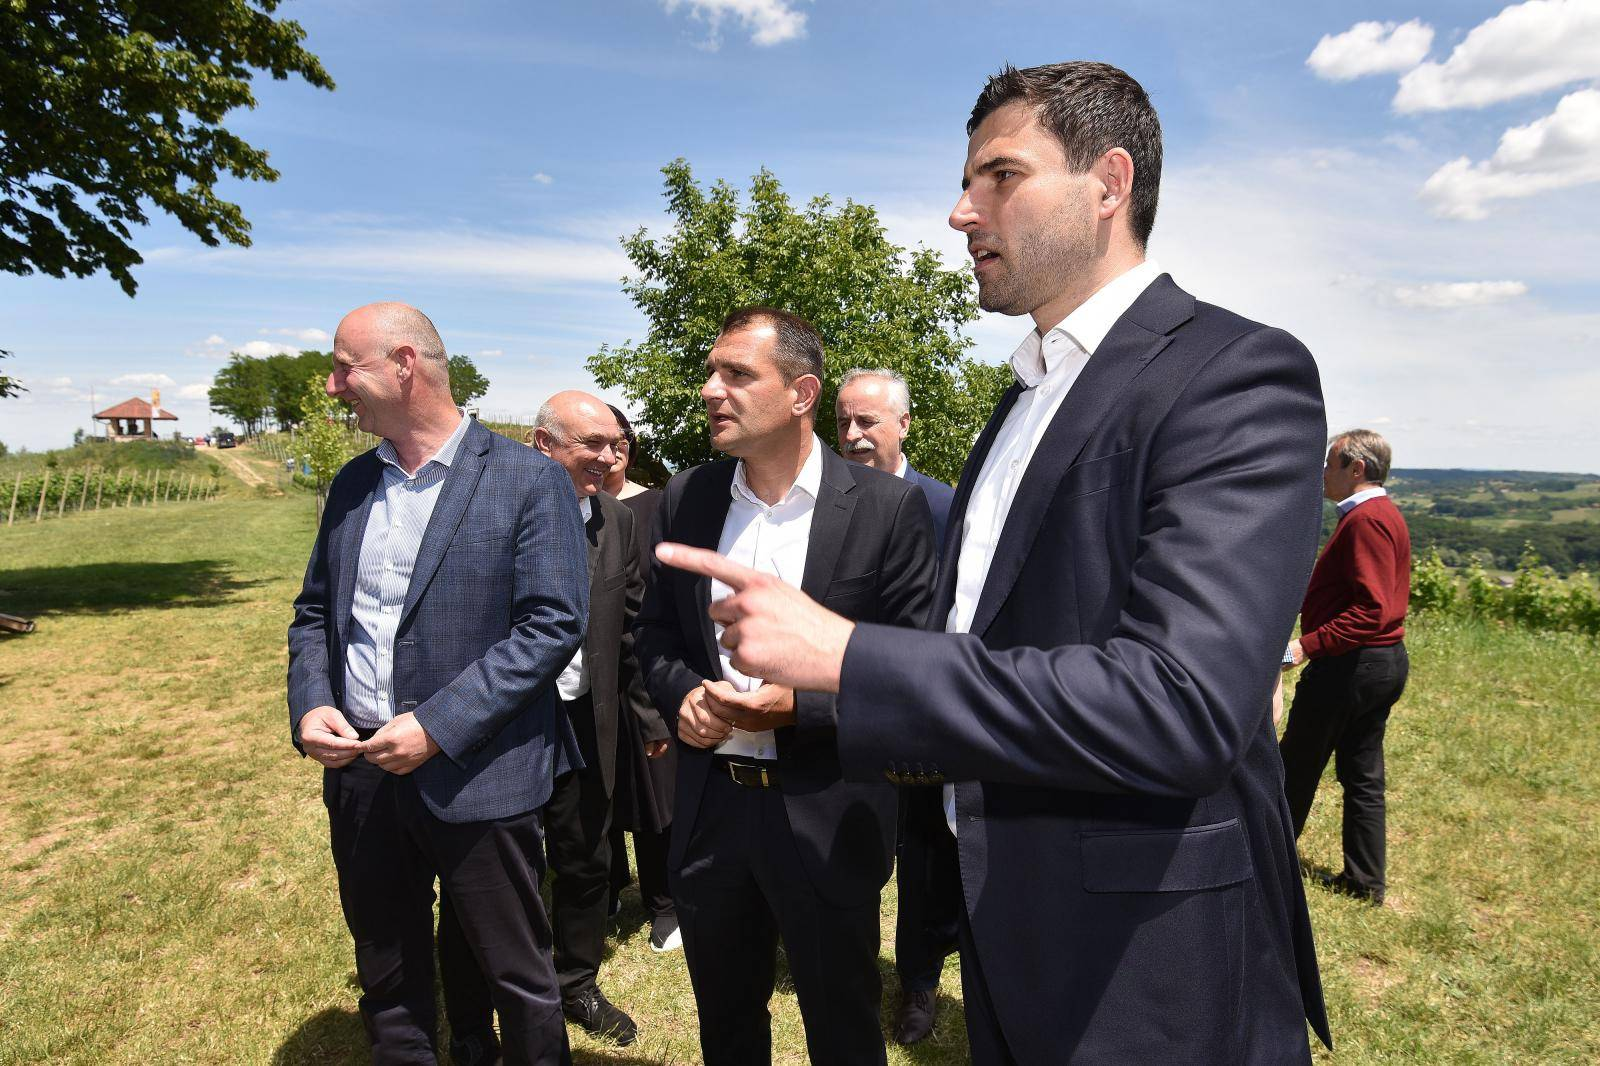 Štrigova: Međimurski župan Matija Posavec potvrdio suradnju s Restart koalicijom